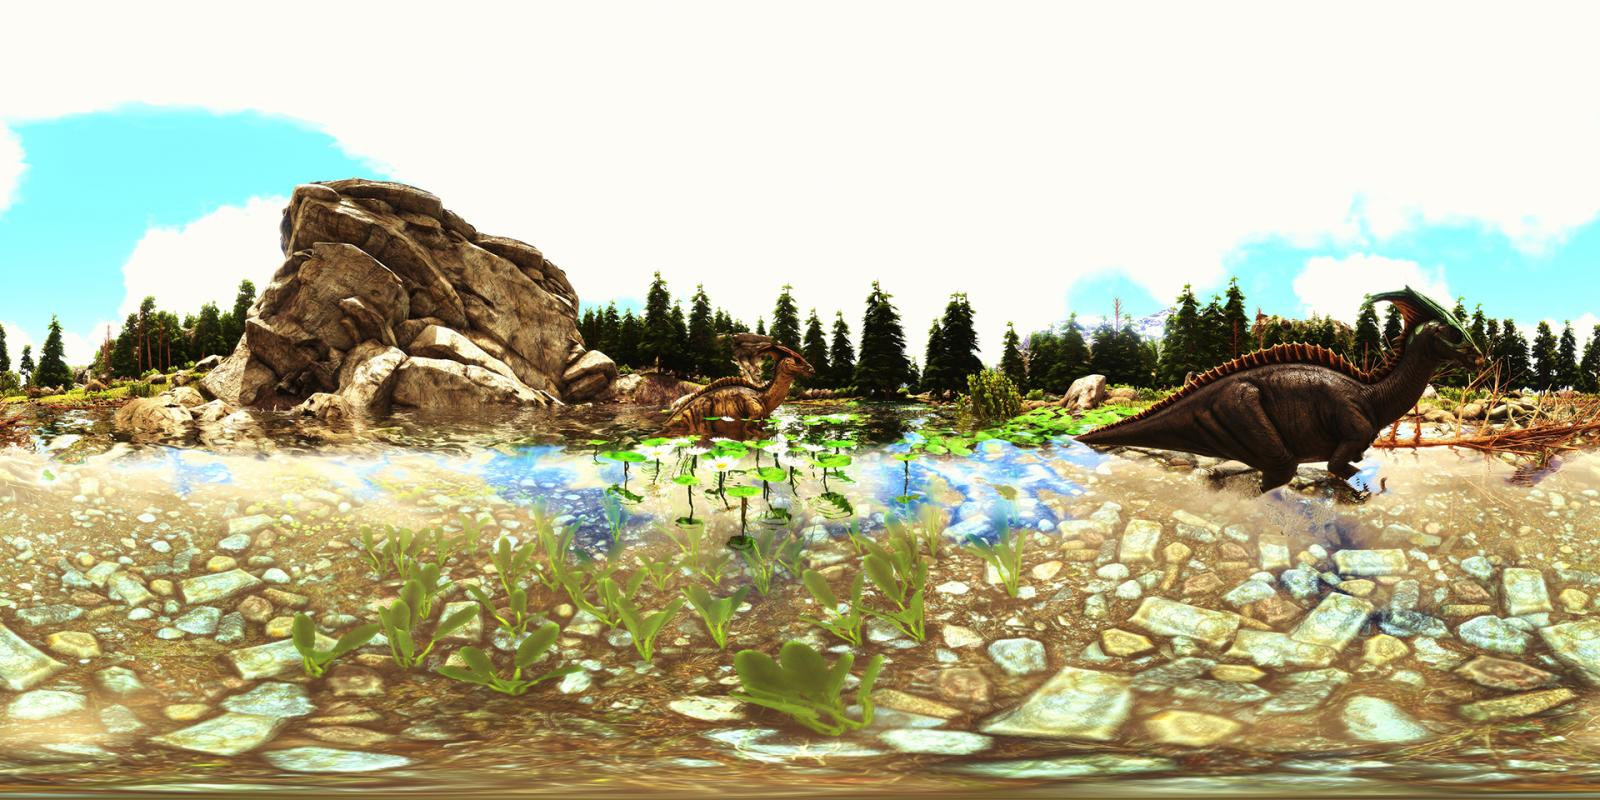 large.5a7504e88c75a_bluedragon-Peace.jpg